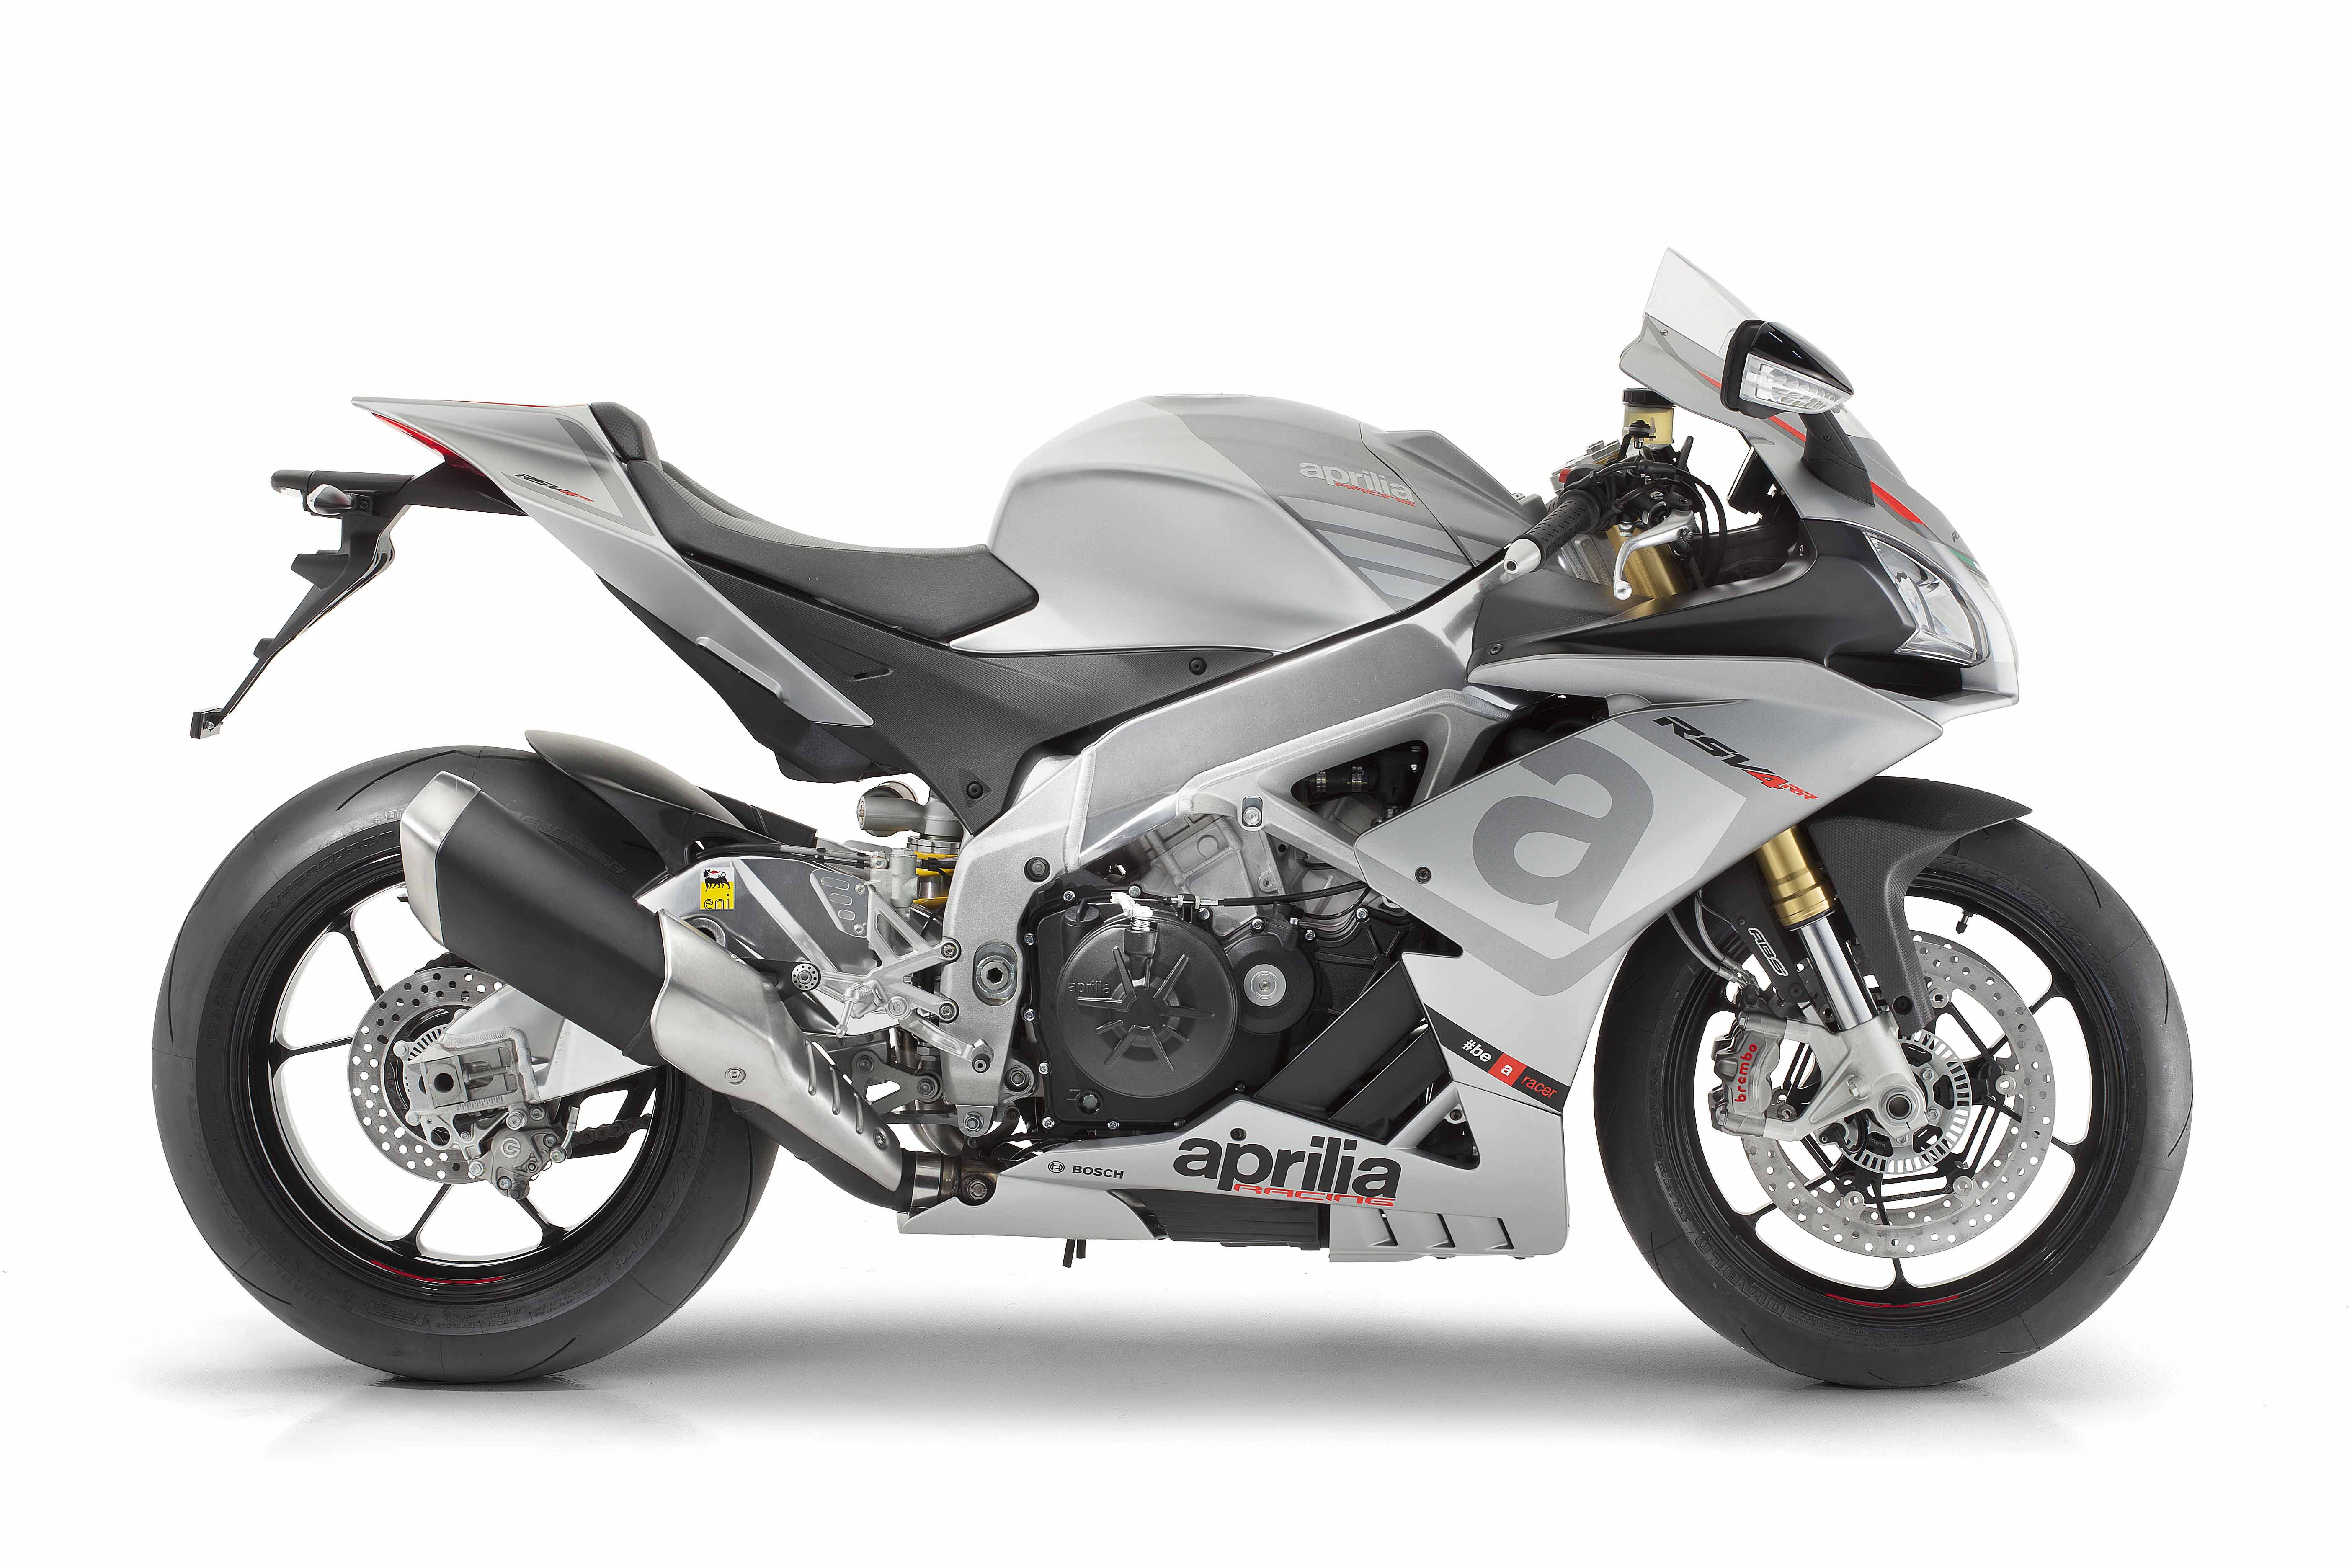 2015 Aprilia Rsv4 Rr 201hp Of Italian Superbike